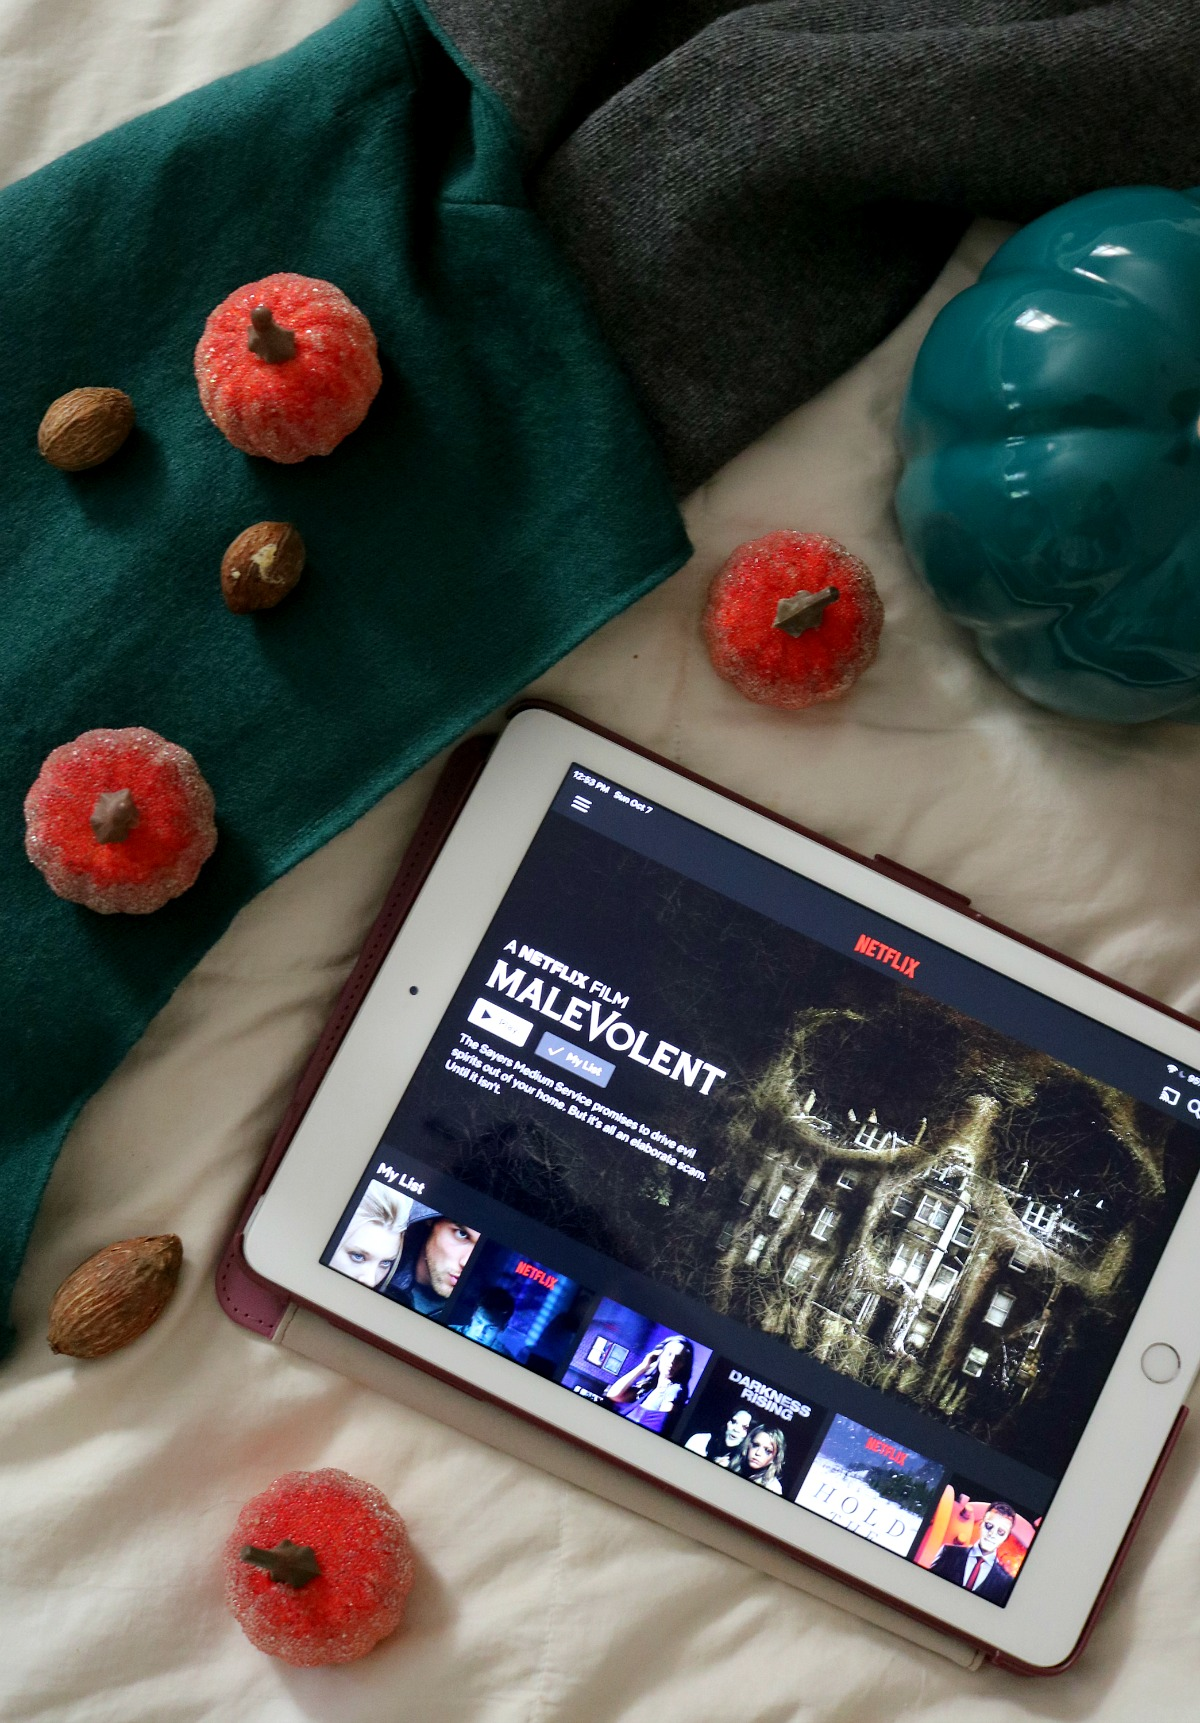 Netflix Halloween Picks I Scary Movies to get you in the Halloween spirit in 2018. #Netflix #Halloween #ScaryMovies